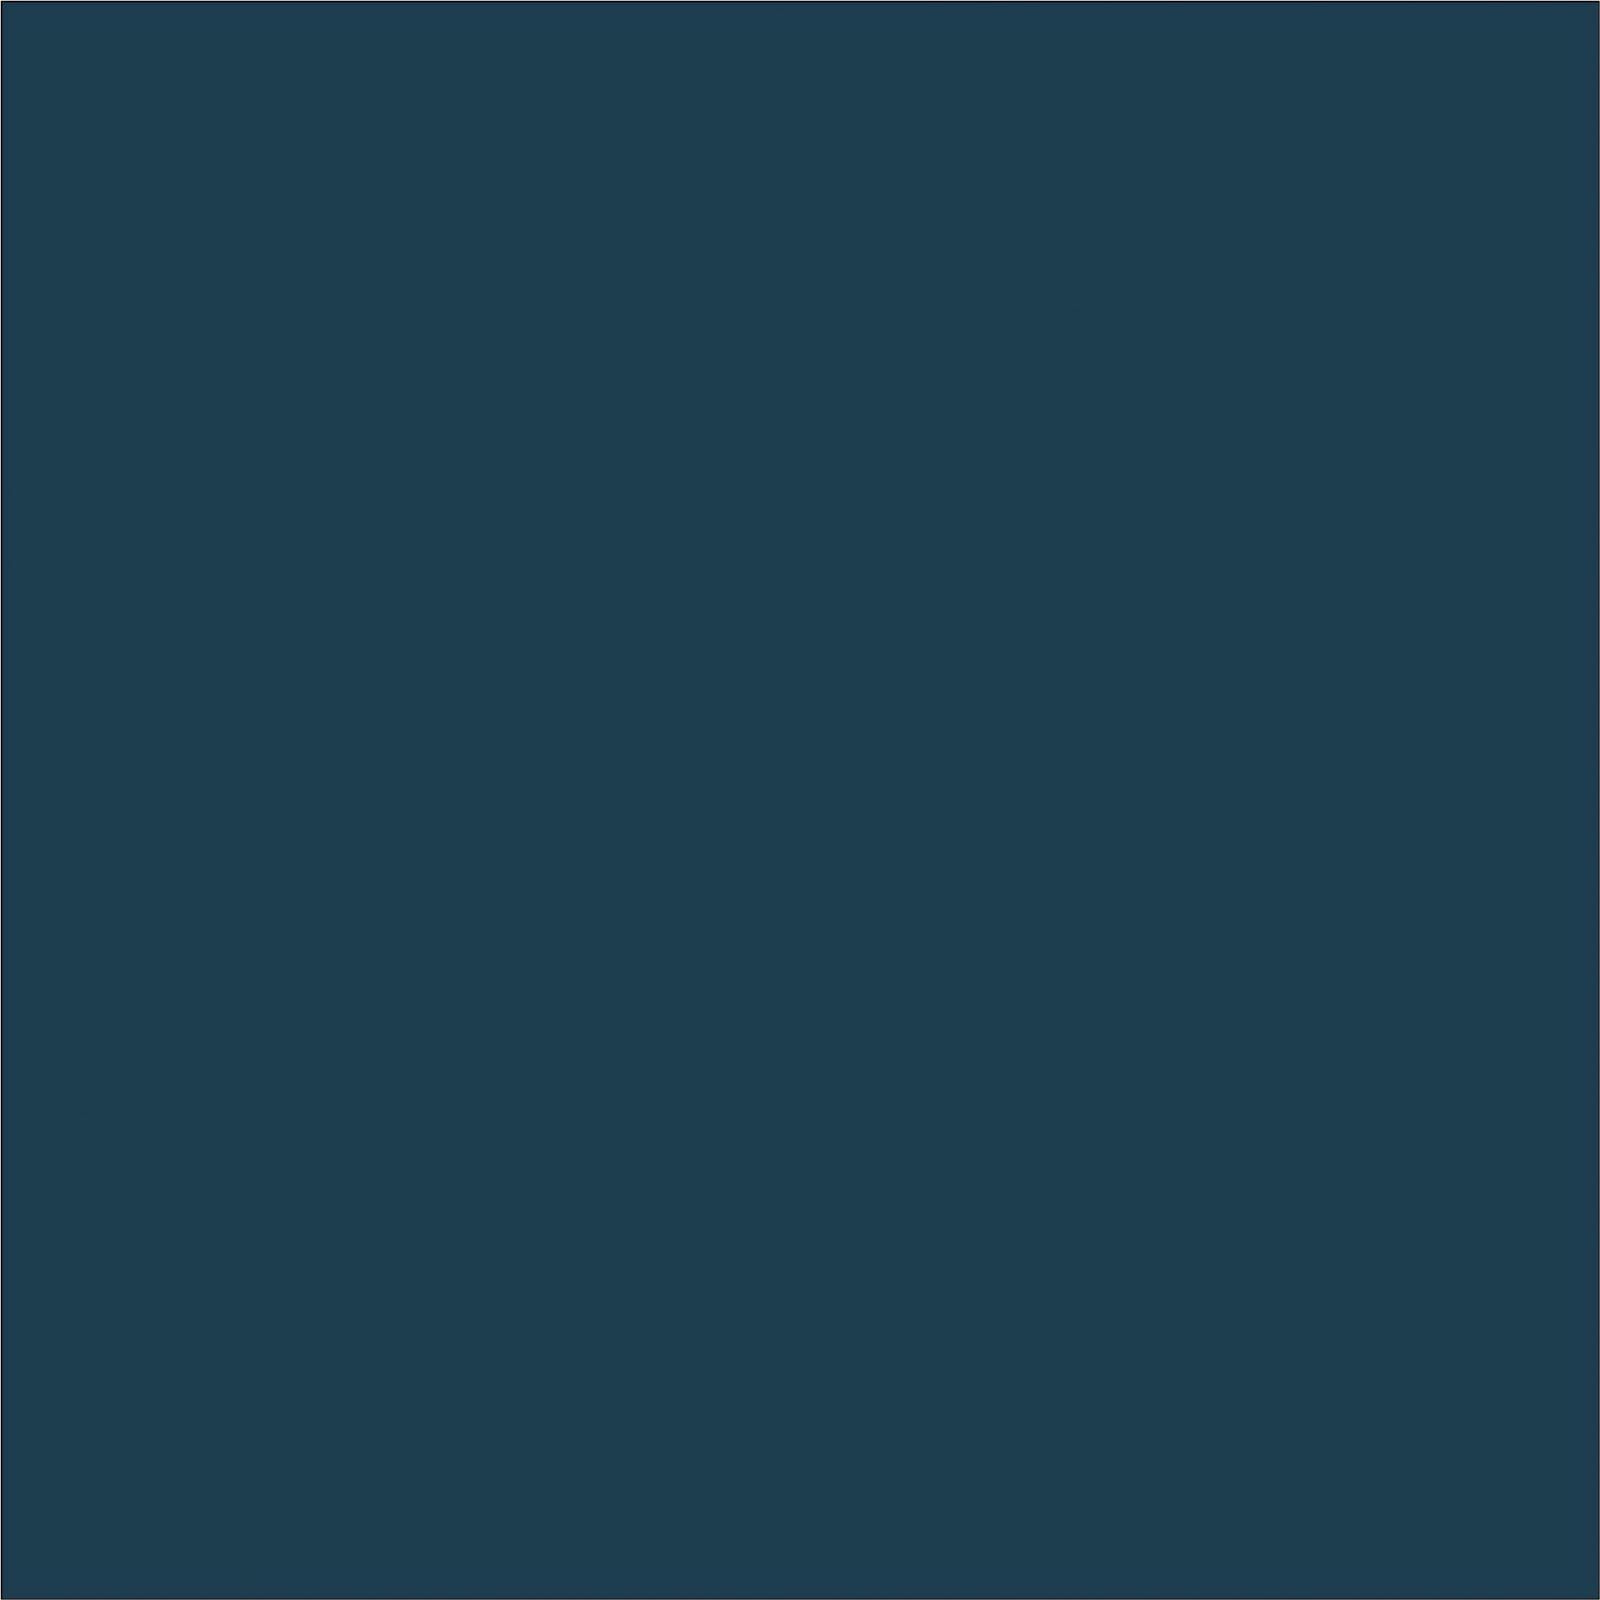 Colour Swatch of Atlantic